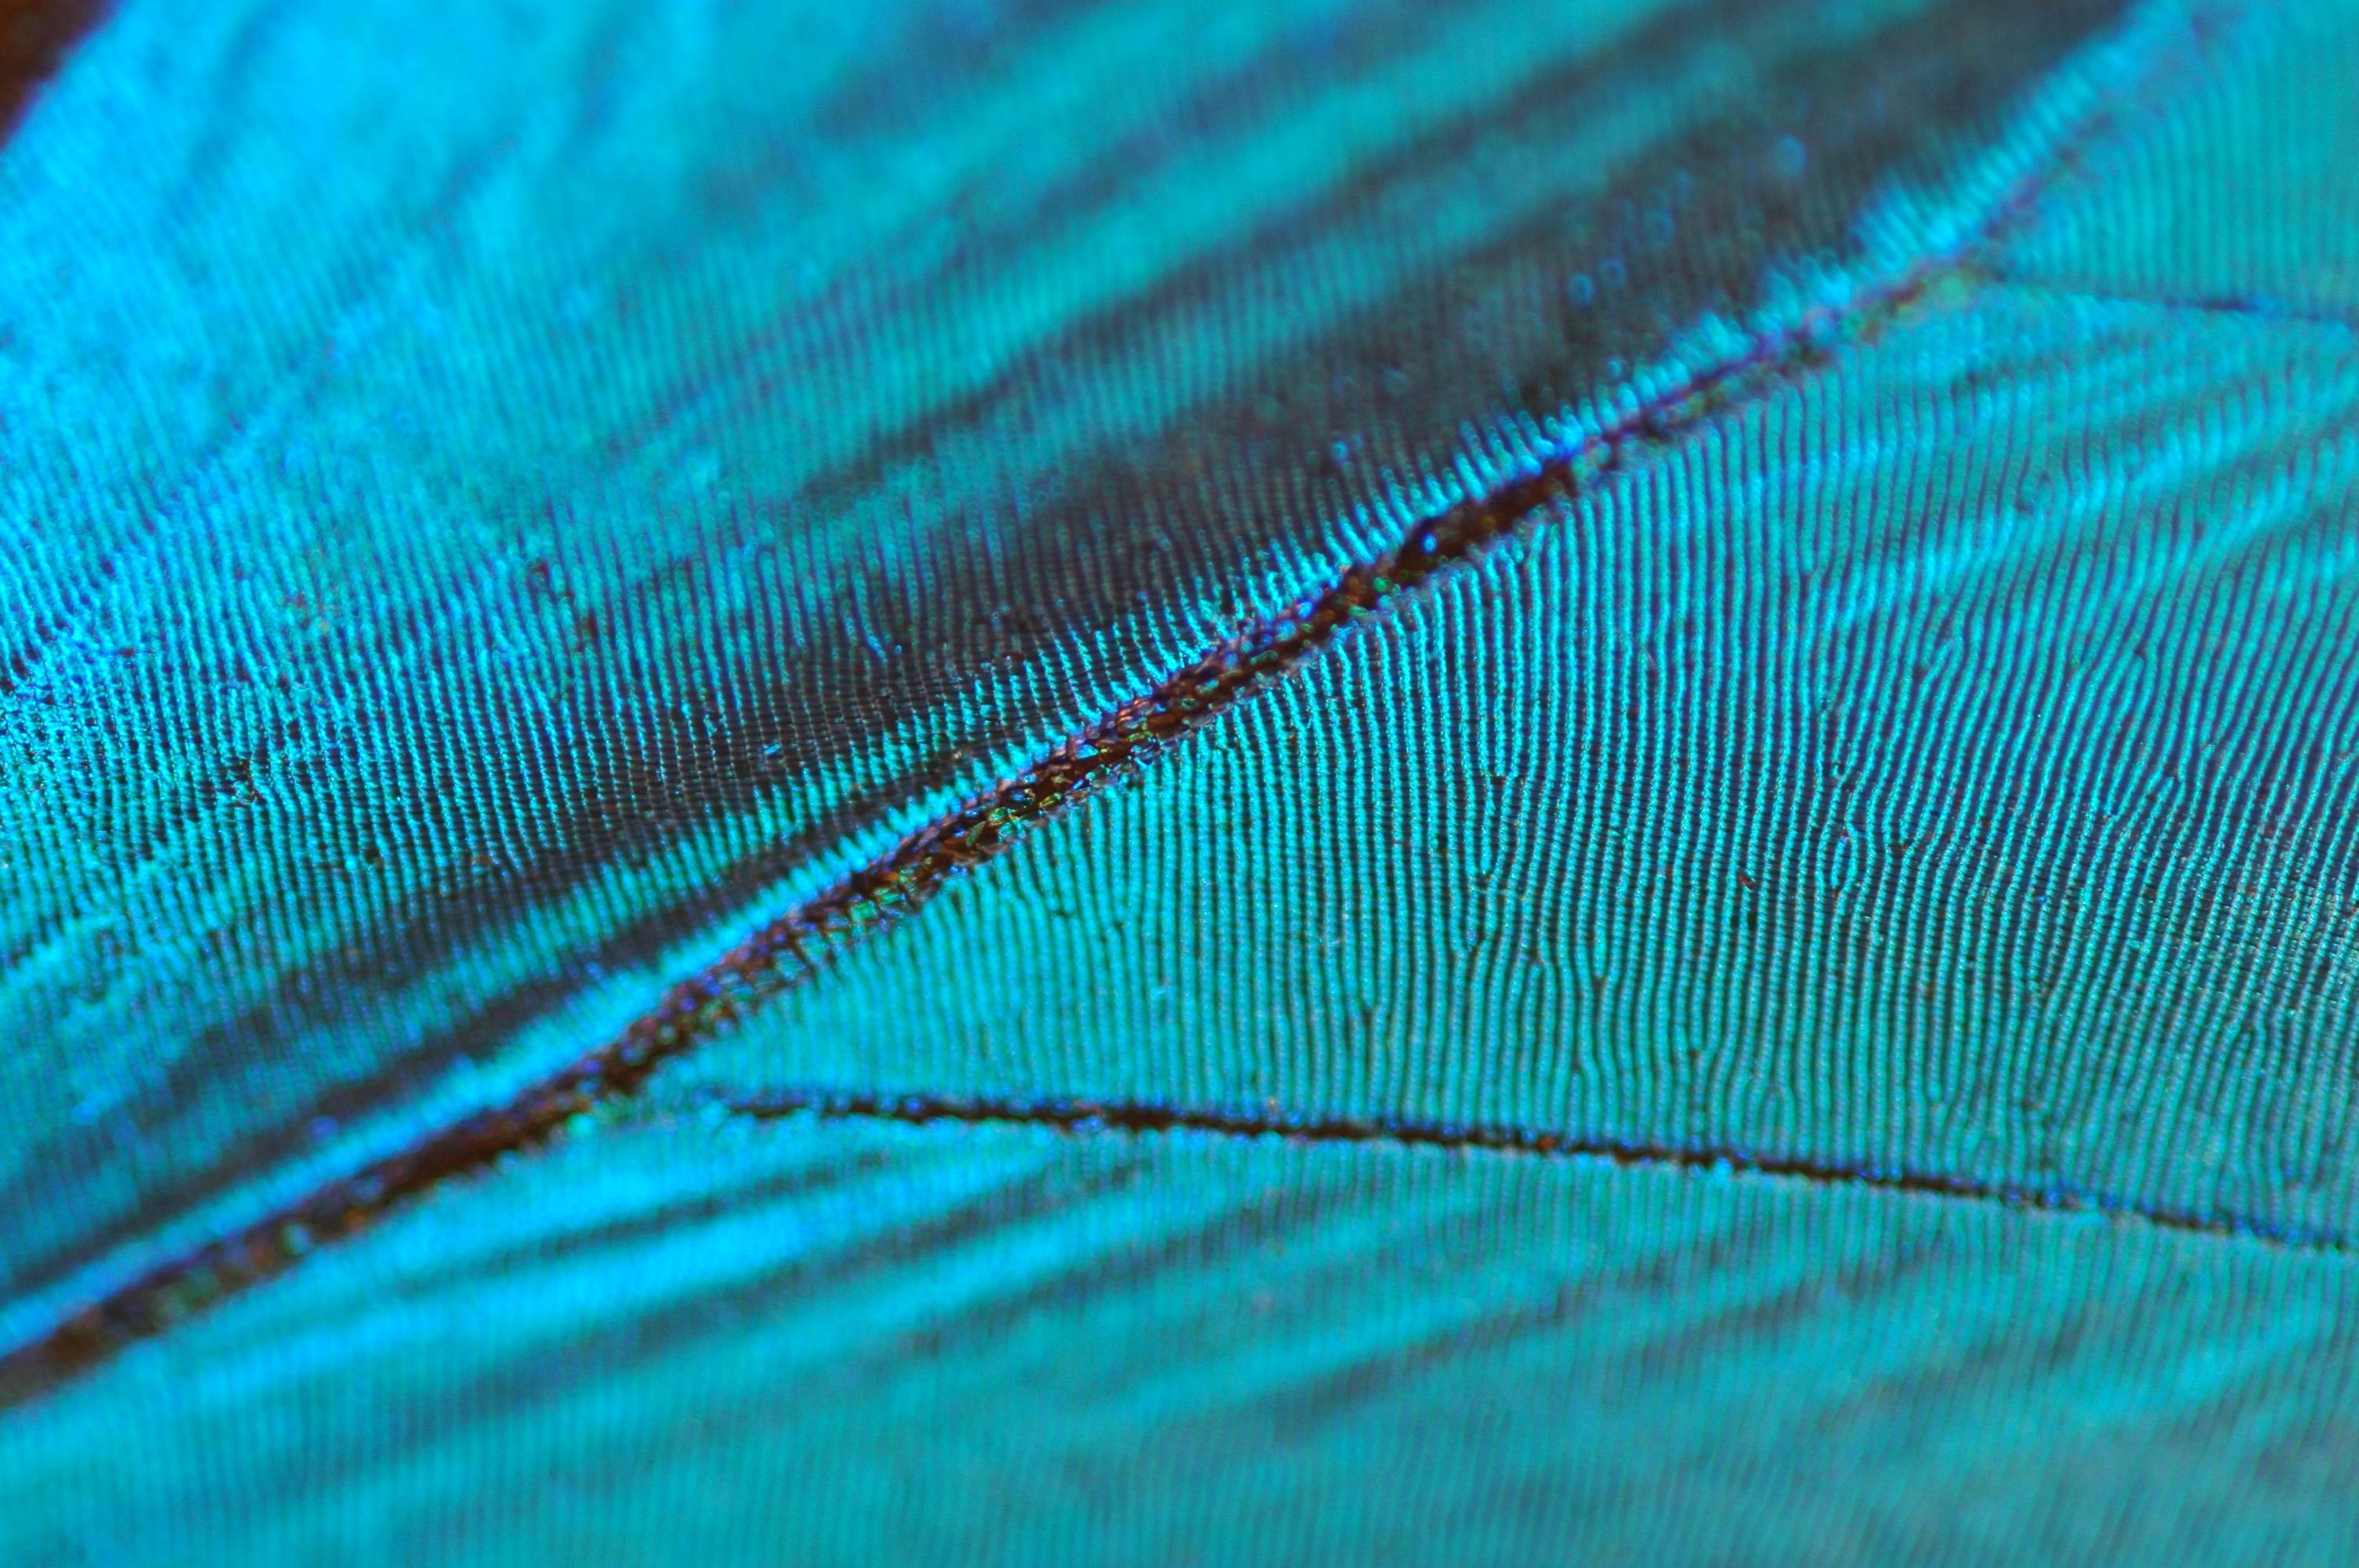 Scientific Image Blue Morpho Butterfly Wing Nise Network